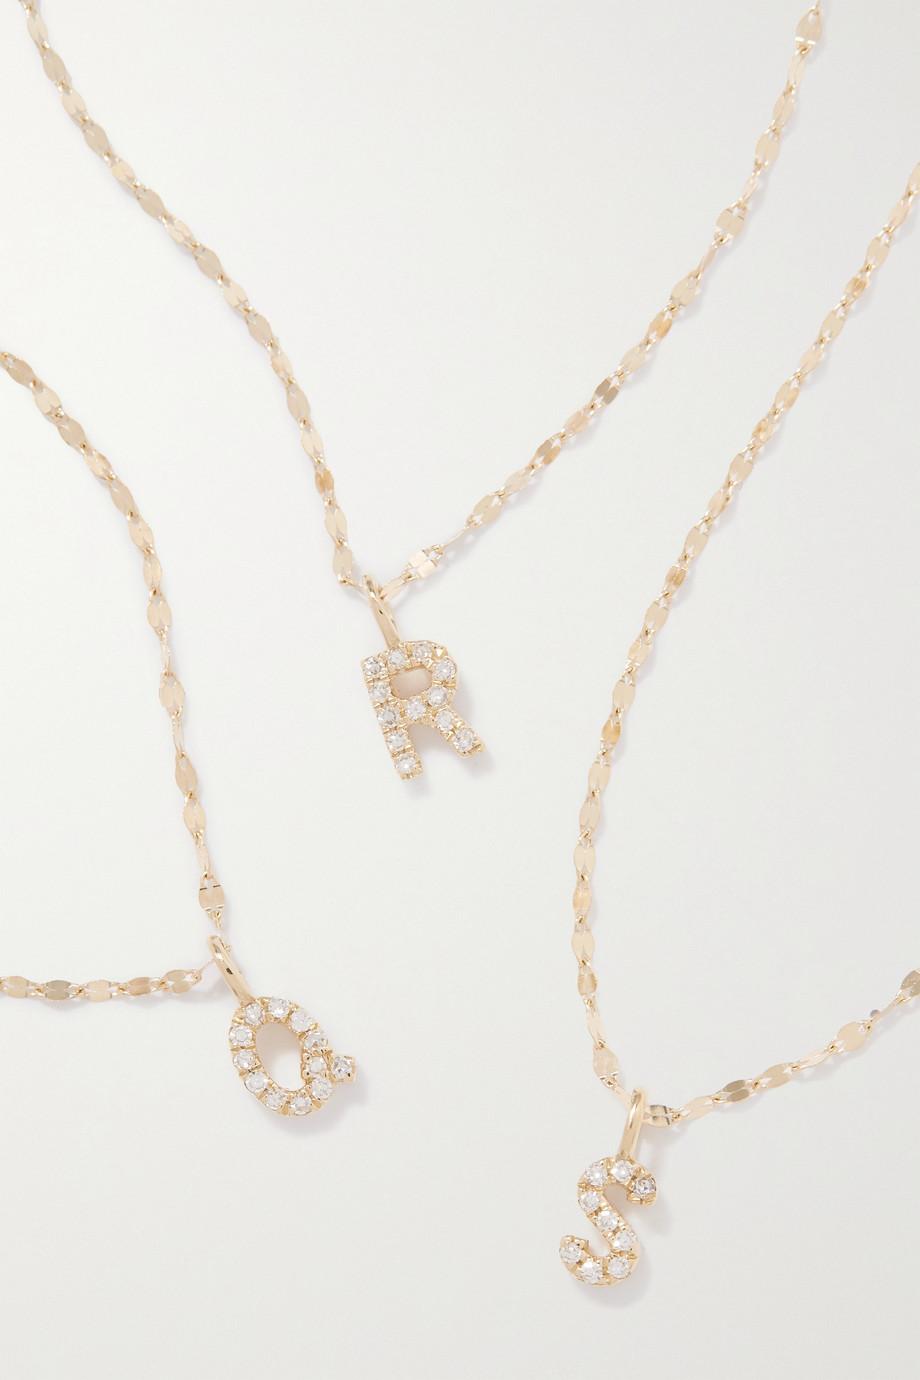 STONE AND STRAND Initial Sparkle Kette aus Gold mit Diamanten